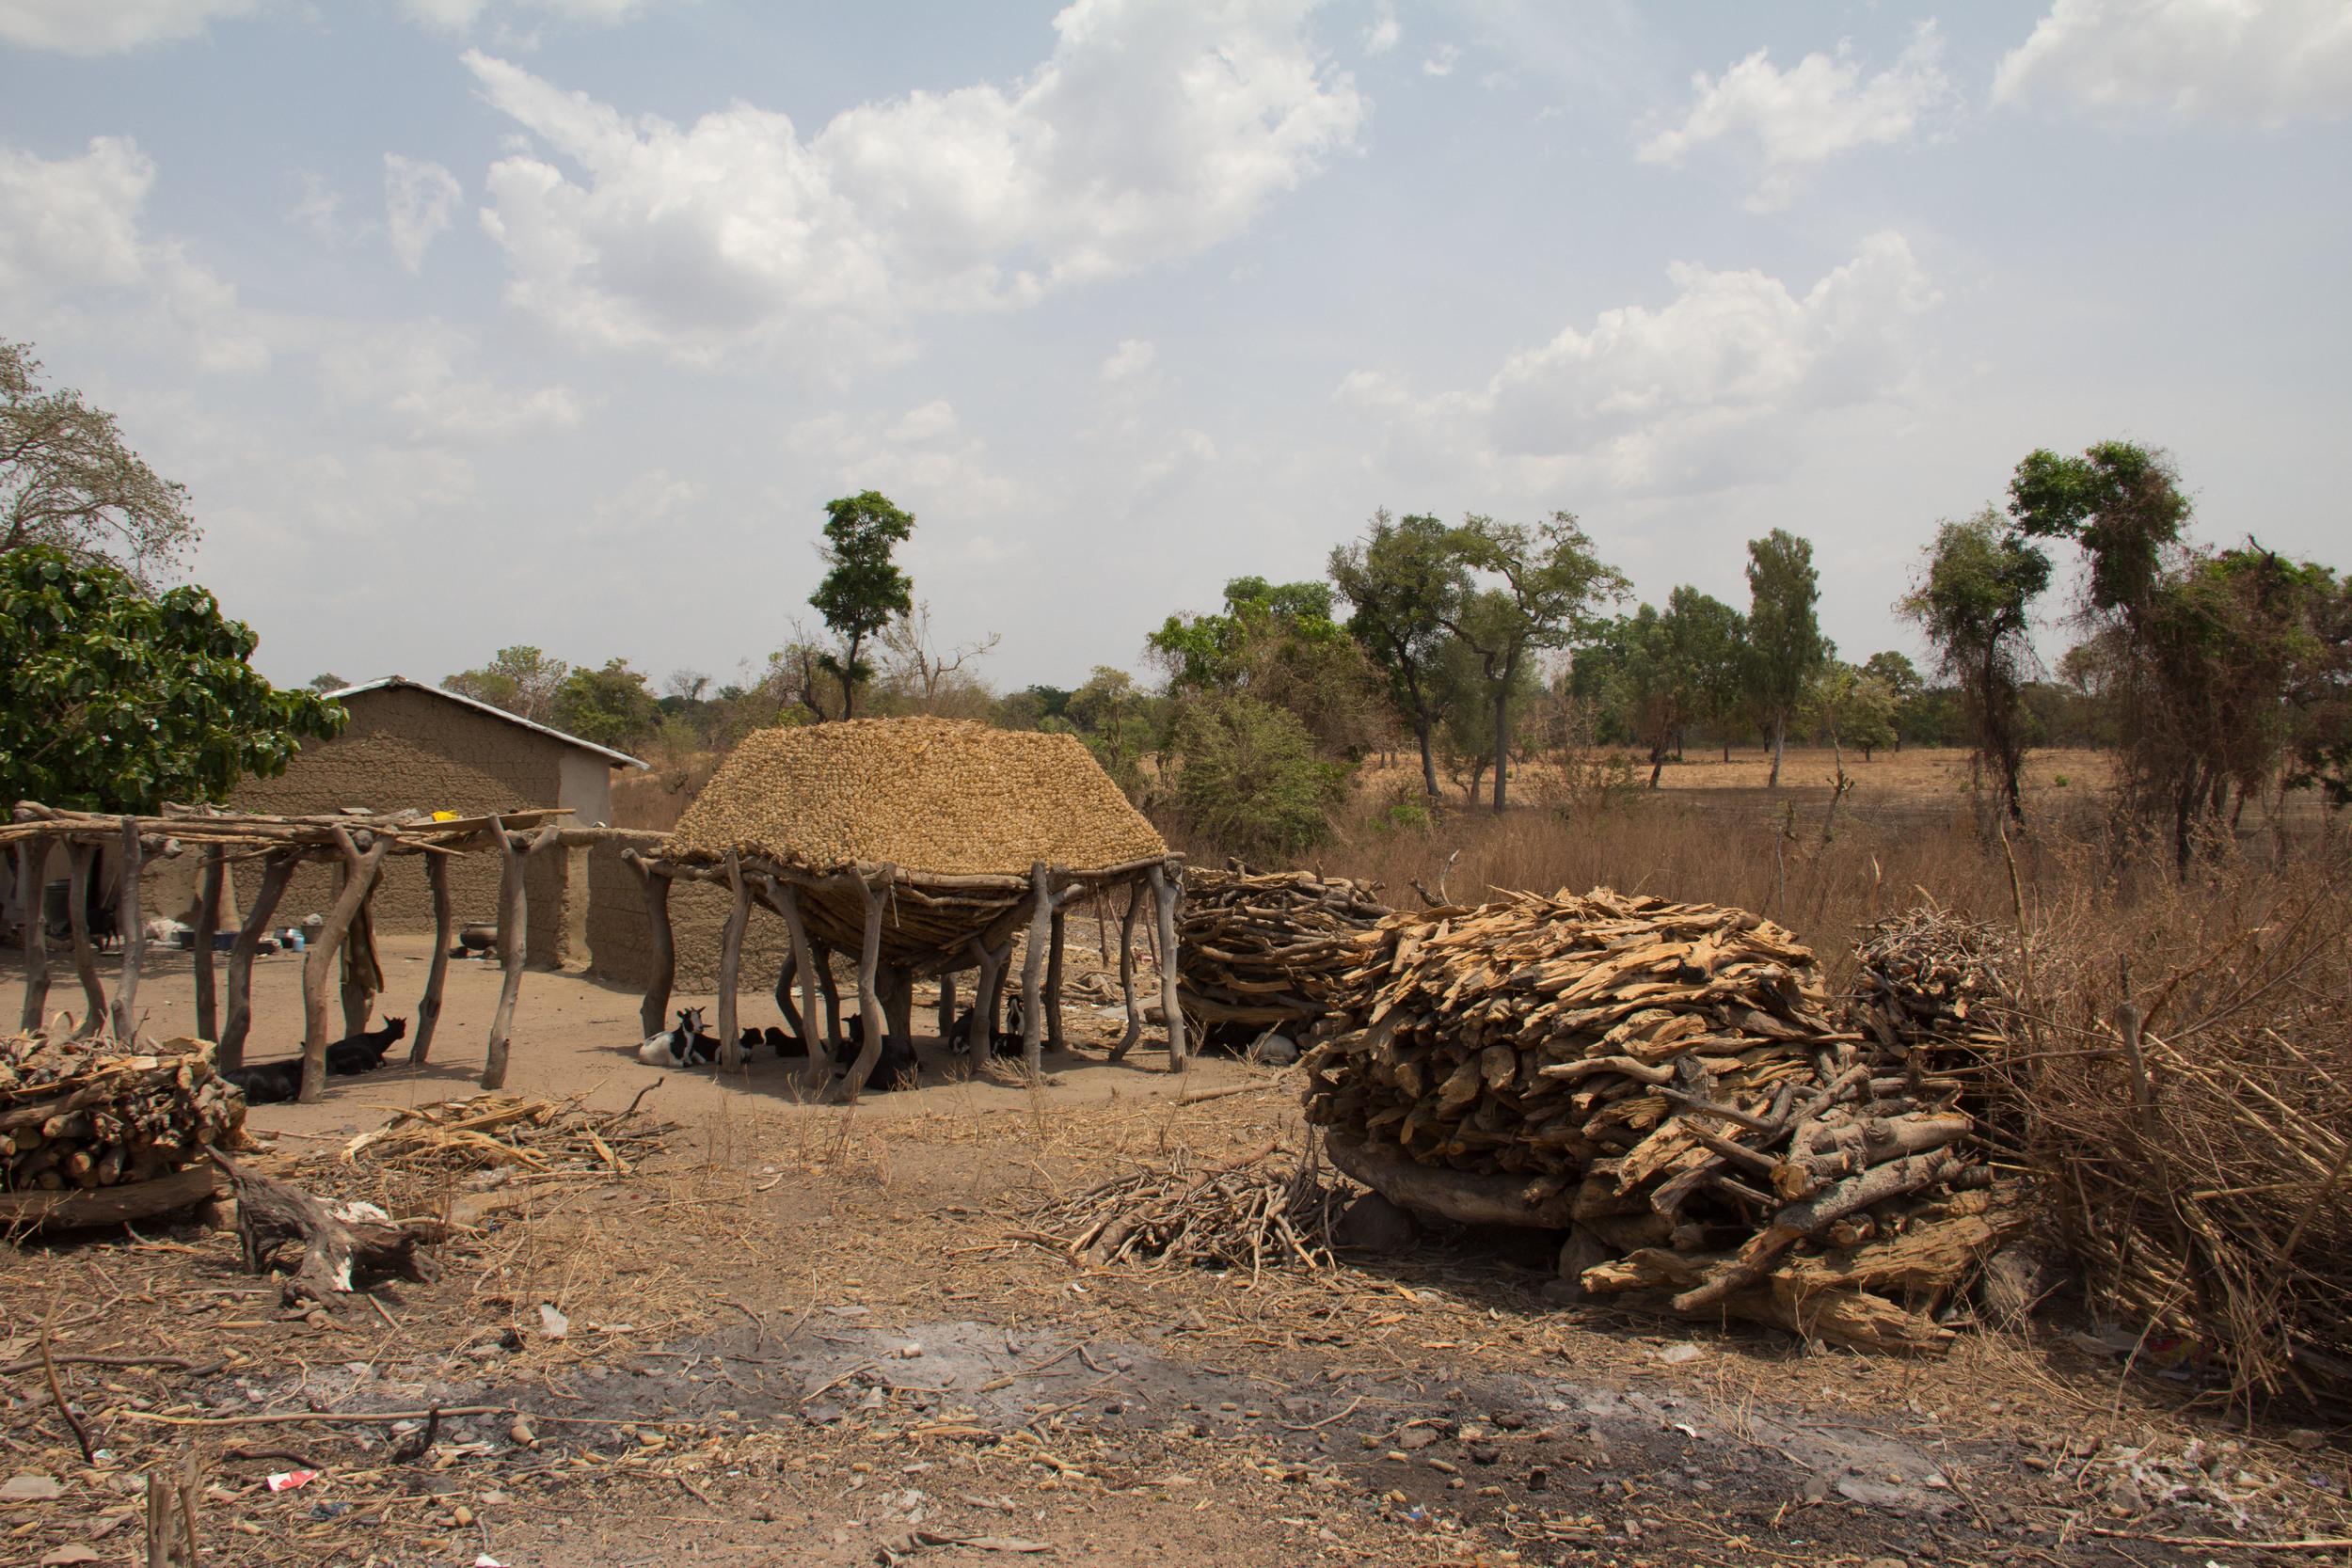 Biomass fuel stockpiles